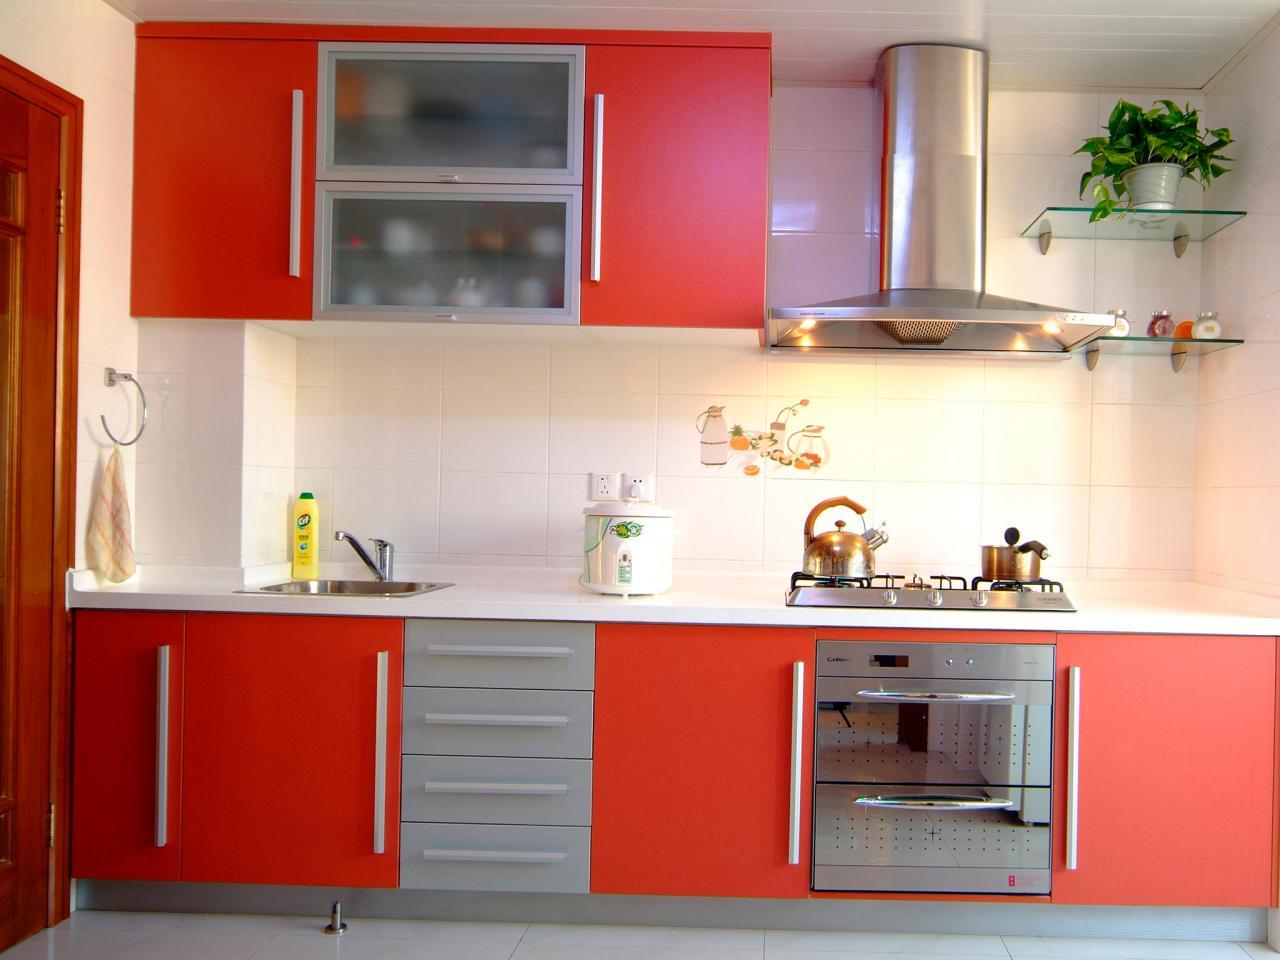 cupboards for kitchens red kitchen cabinets NZQPVZX